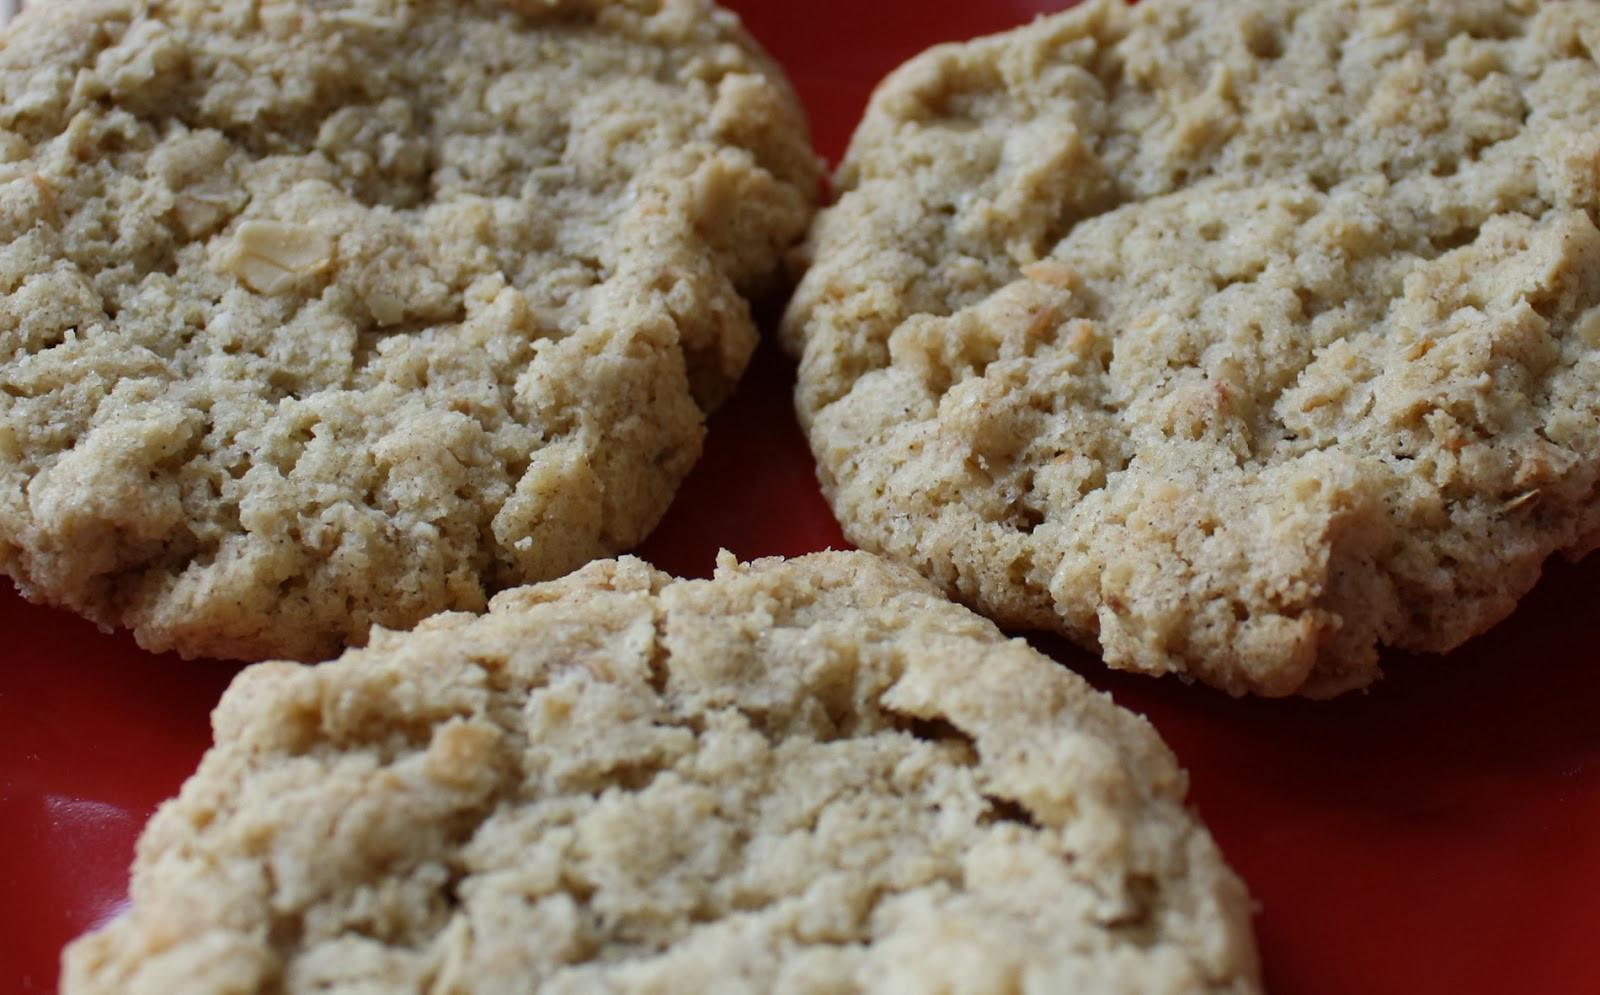 Gluten Free Oatmeal Coconut Cookies  Adaptive Cooking Oatmeal Coconut Cookies Gluten and